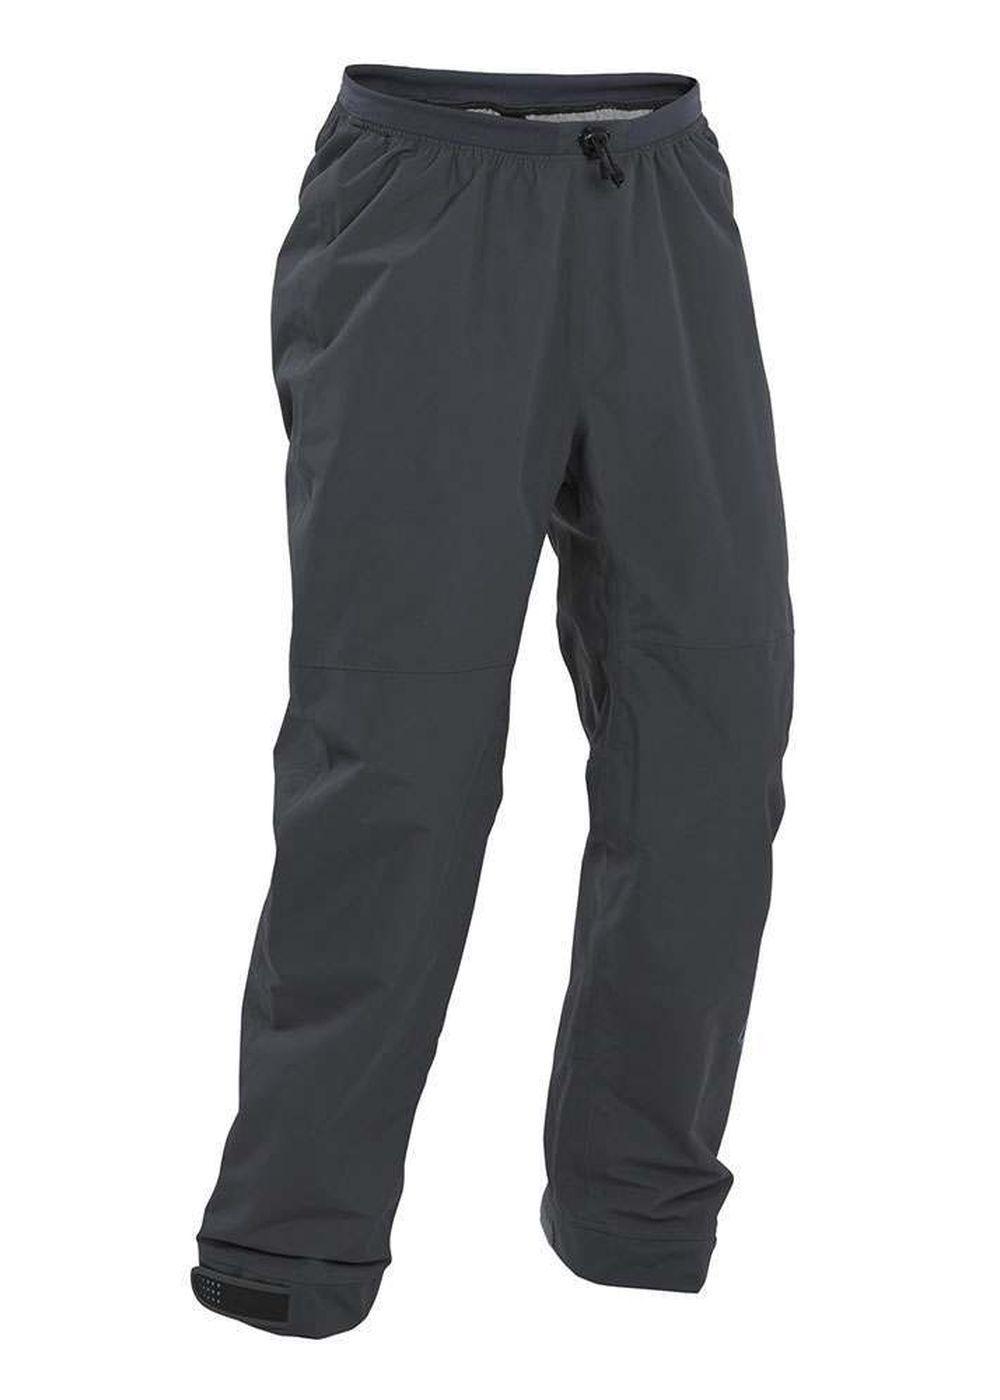 Palm Kayak or Kayaking Lightweight Vector Lightweight Trousers Pants Jet Grey Waterproof /& Breathable